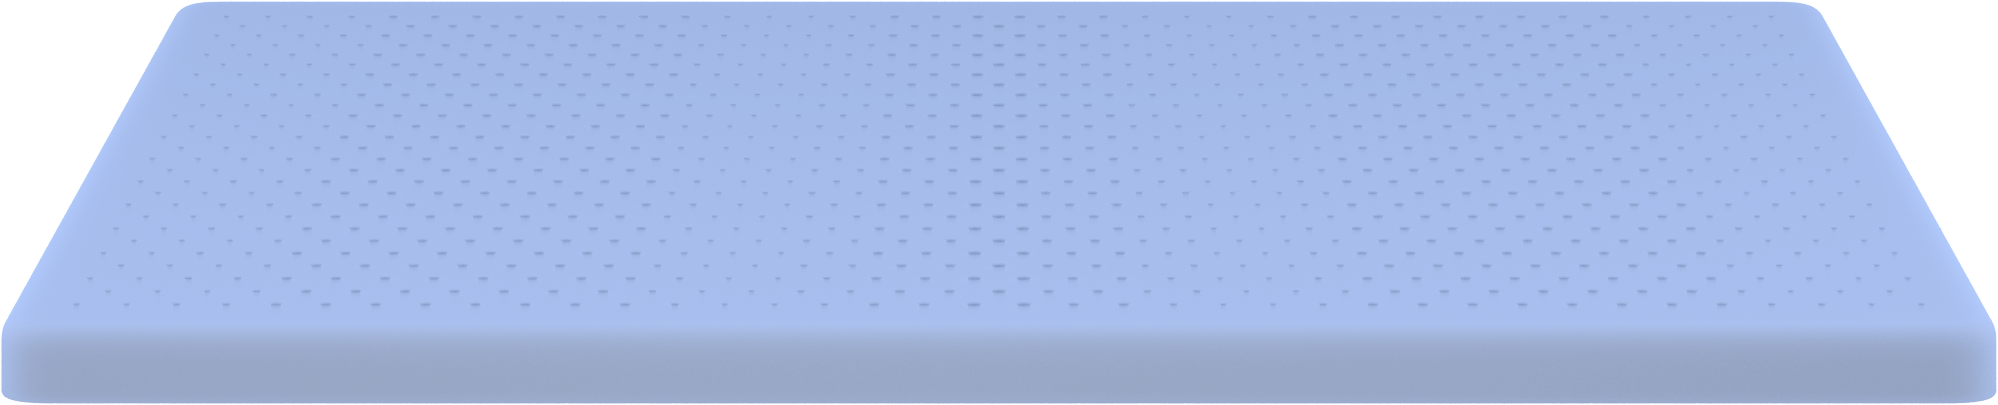 Element mattress top layer render